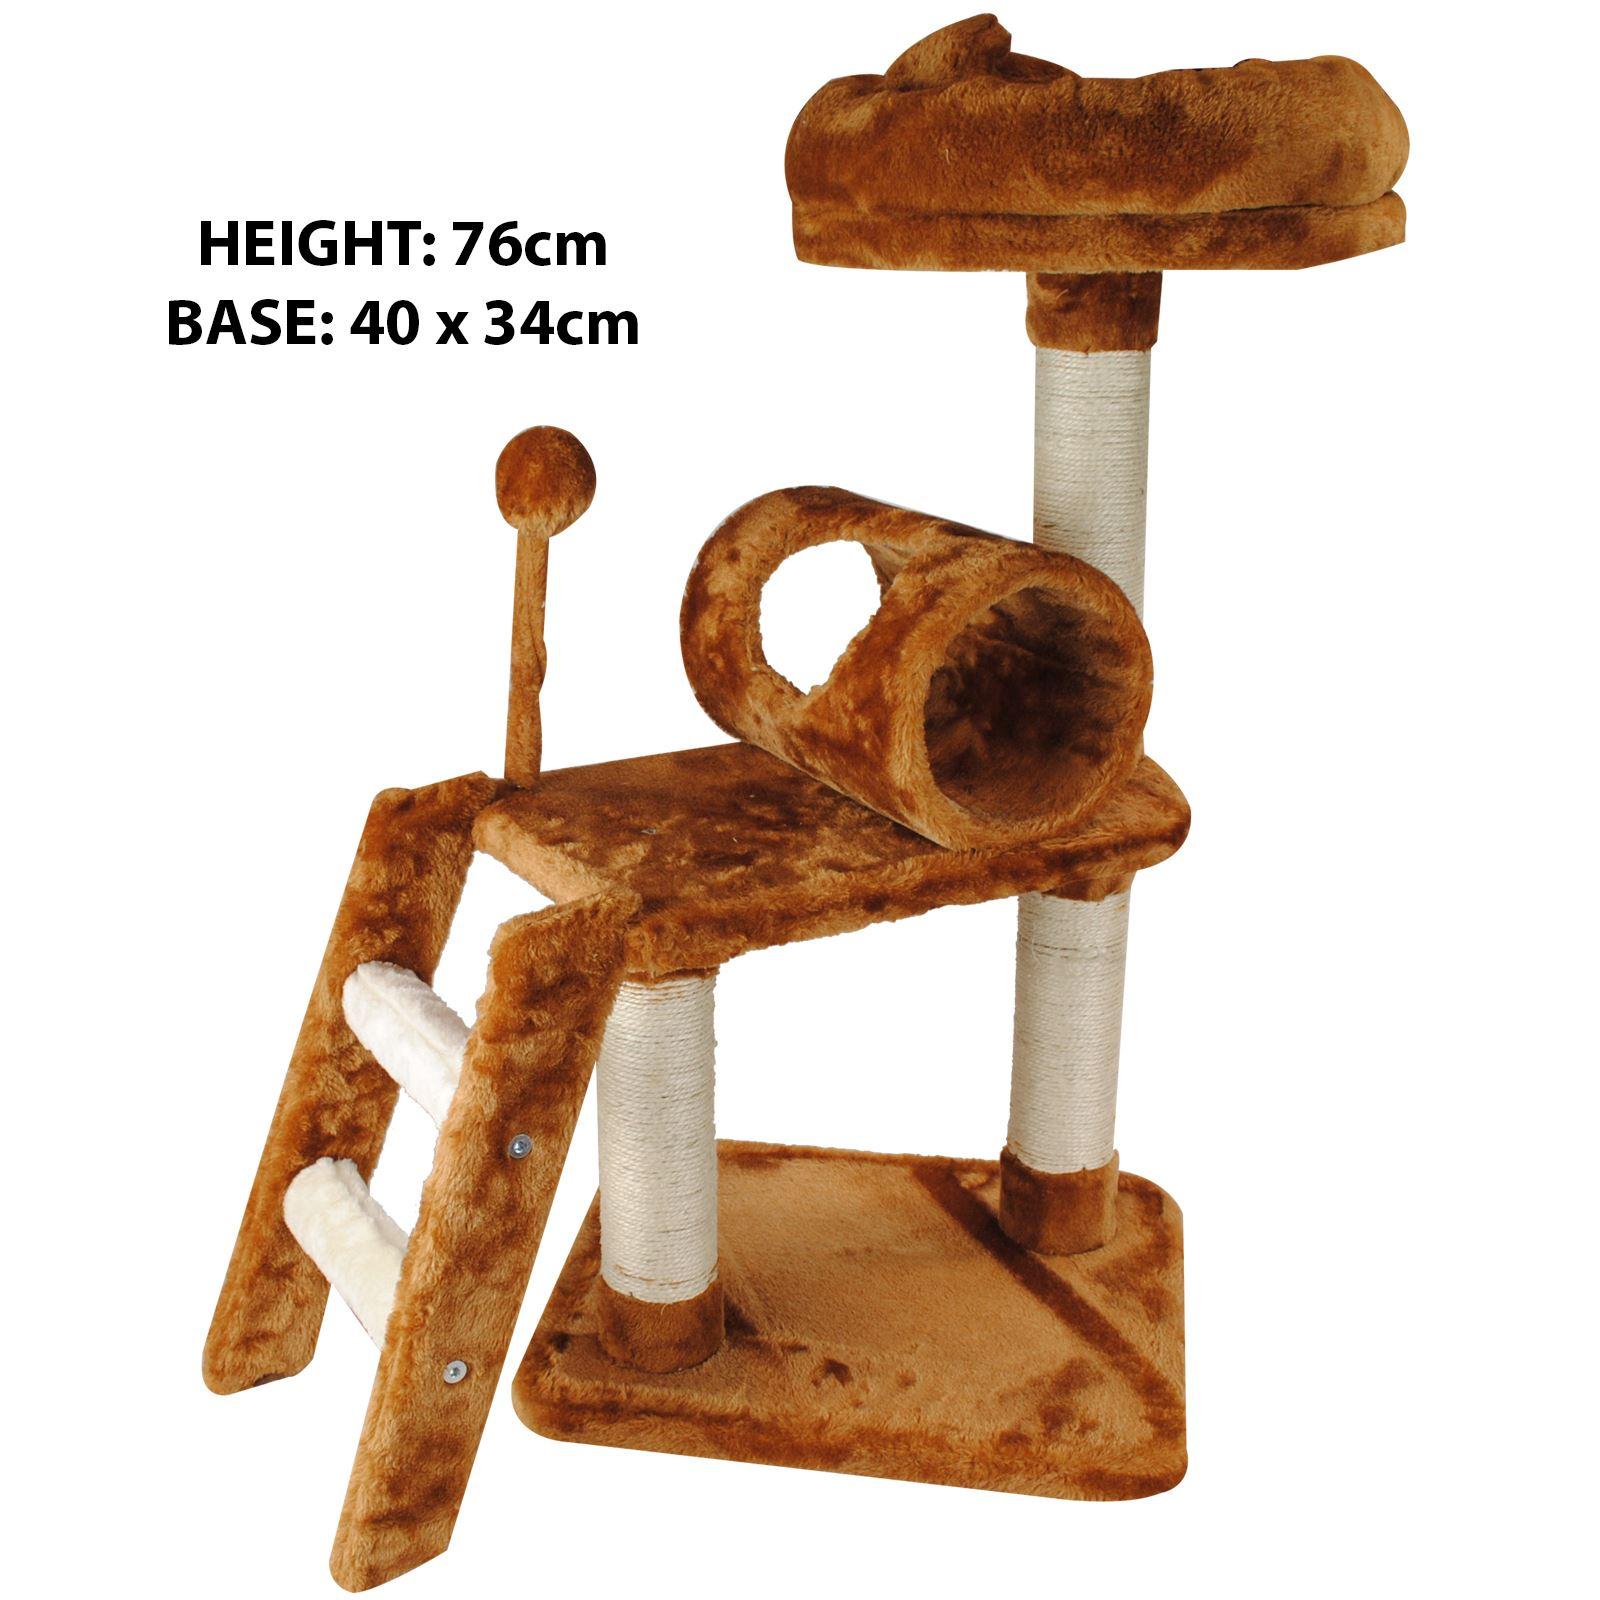 Pet-Cat-Kitten-Scratching-Post-Climbing-Tree-Bed-Rest-Platform-Play-Furniture thumbnail 8